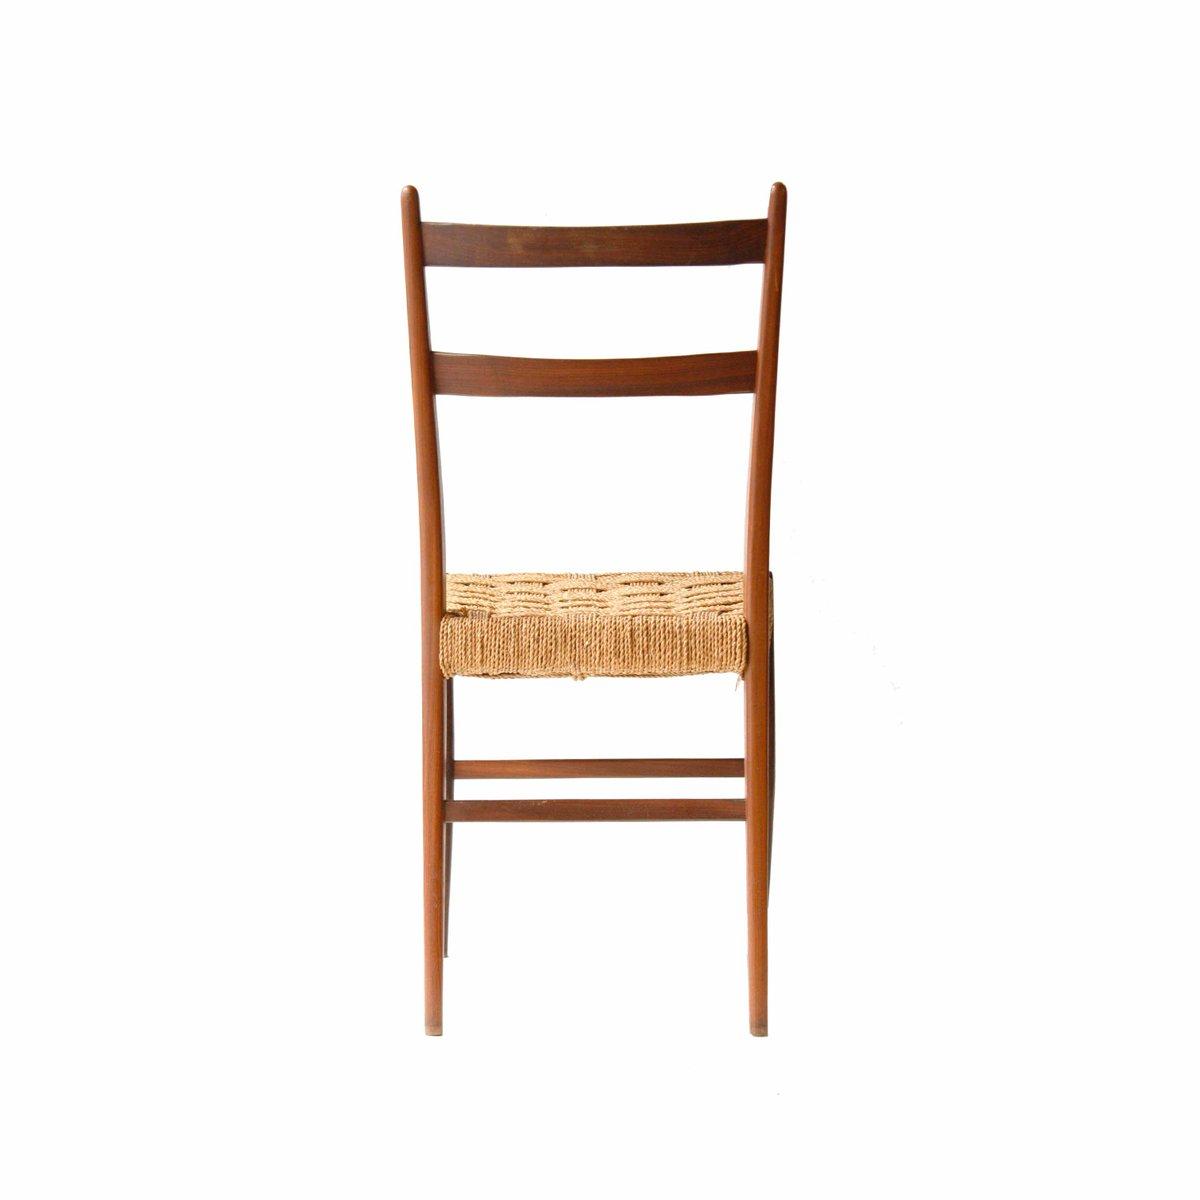 italienische vintage st hle 4er set bei pamono kaufen. Black Bedroom Furniture Sets. Home Design Ideas